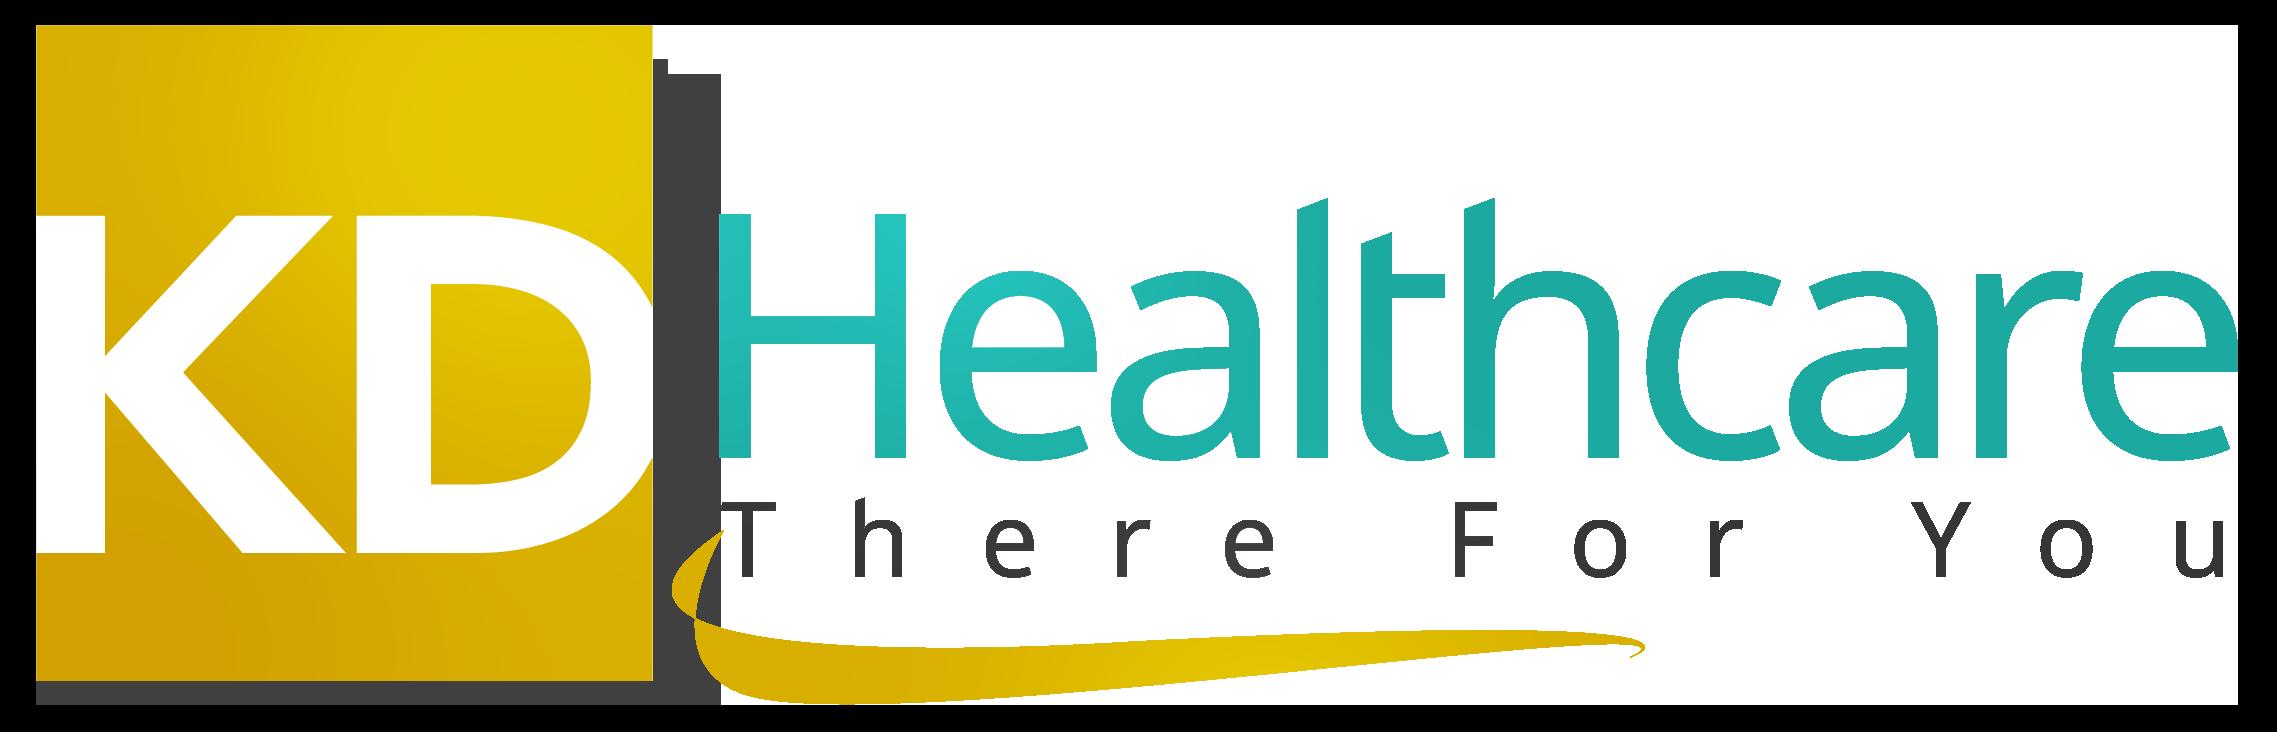 KD Healthcare